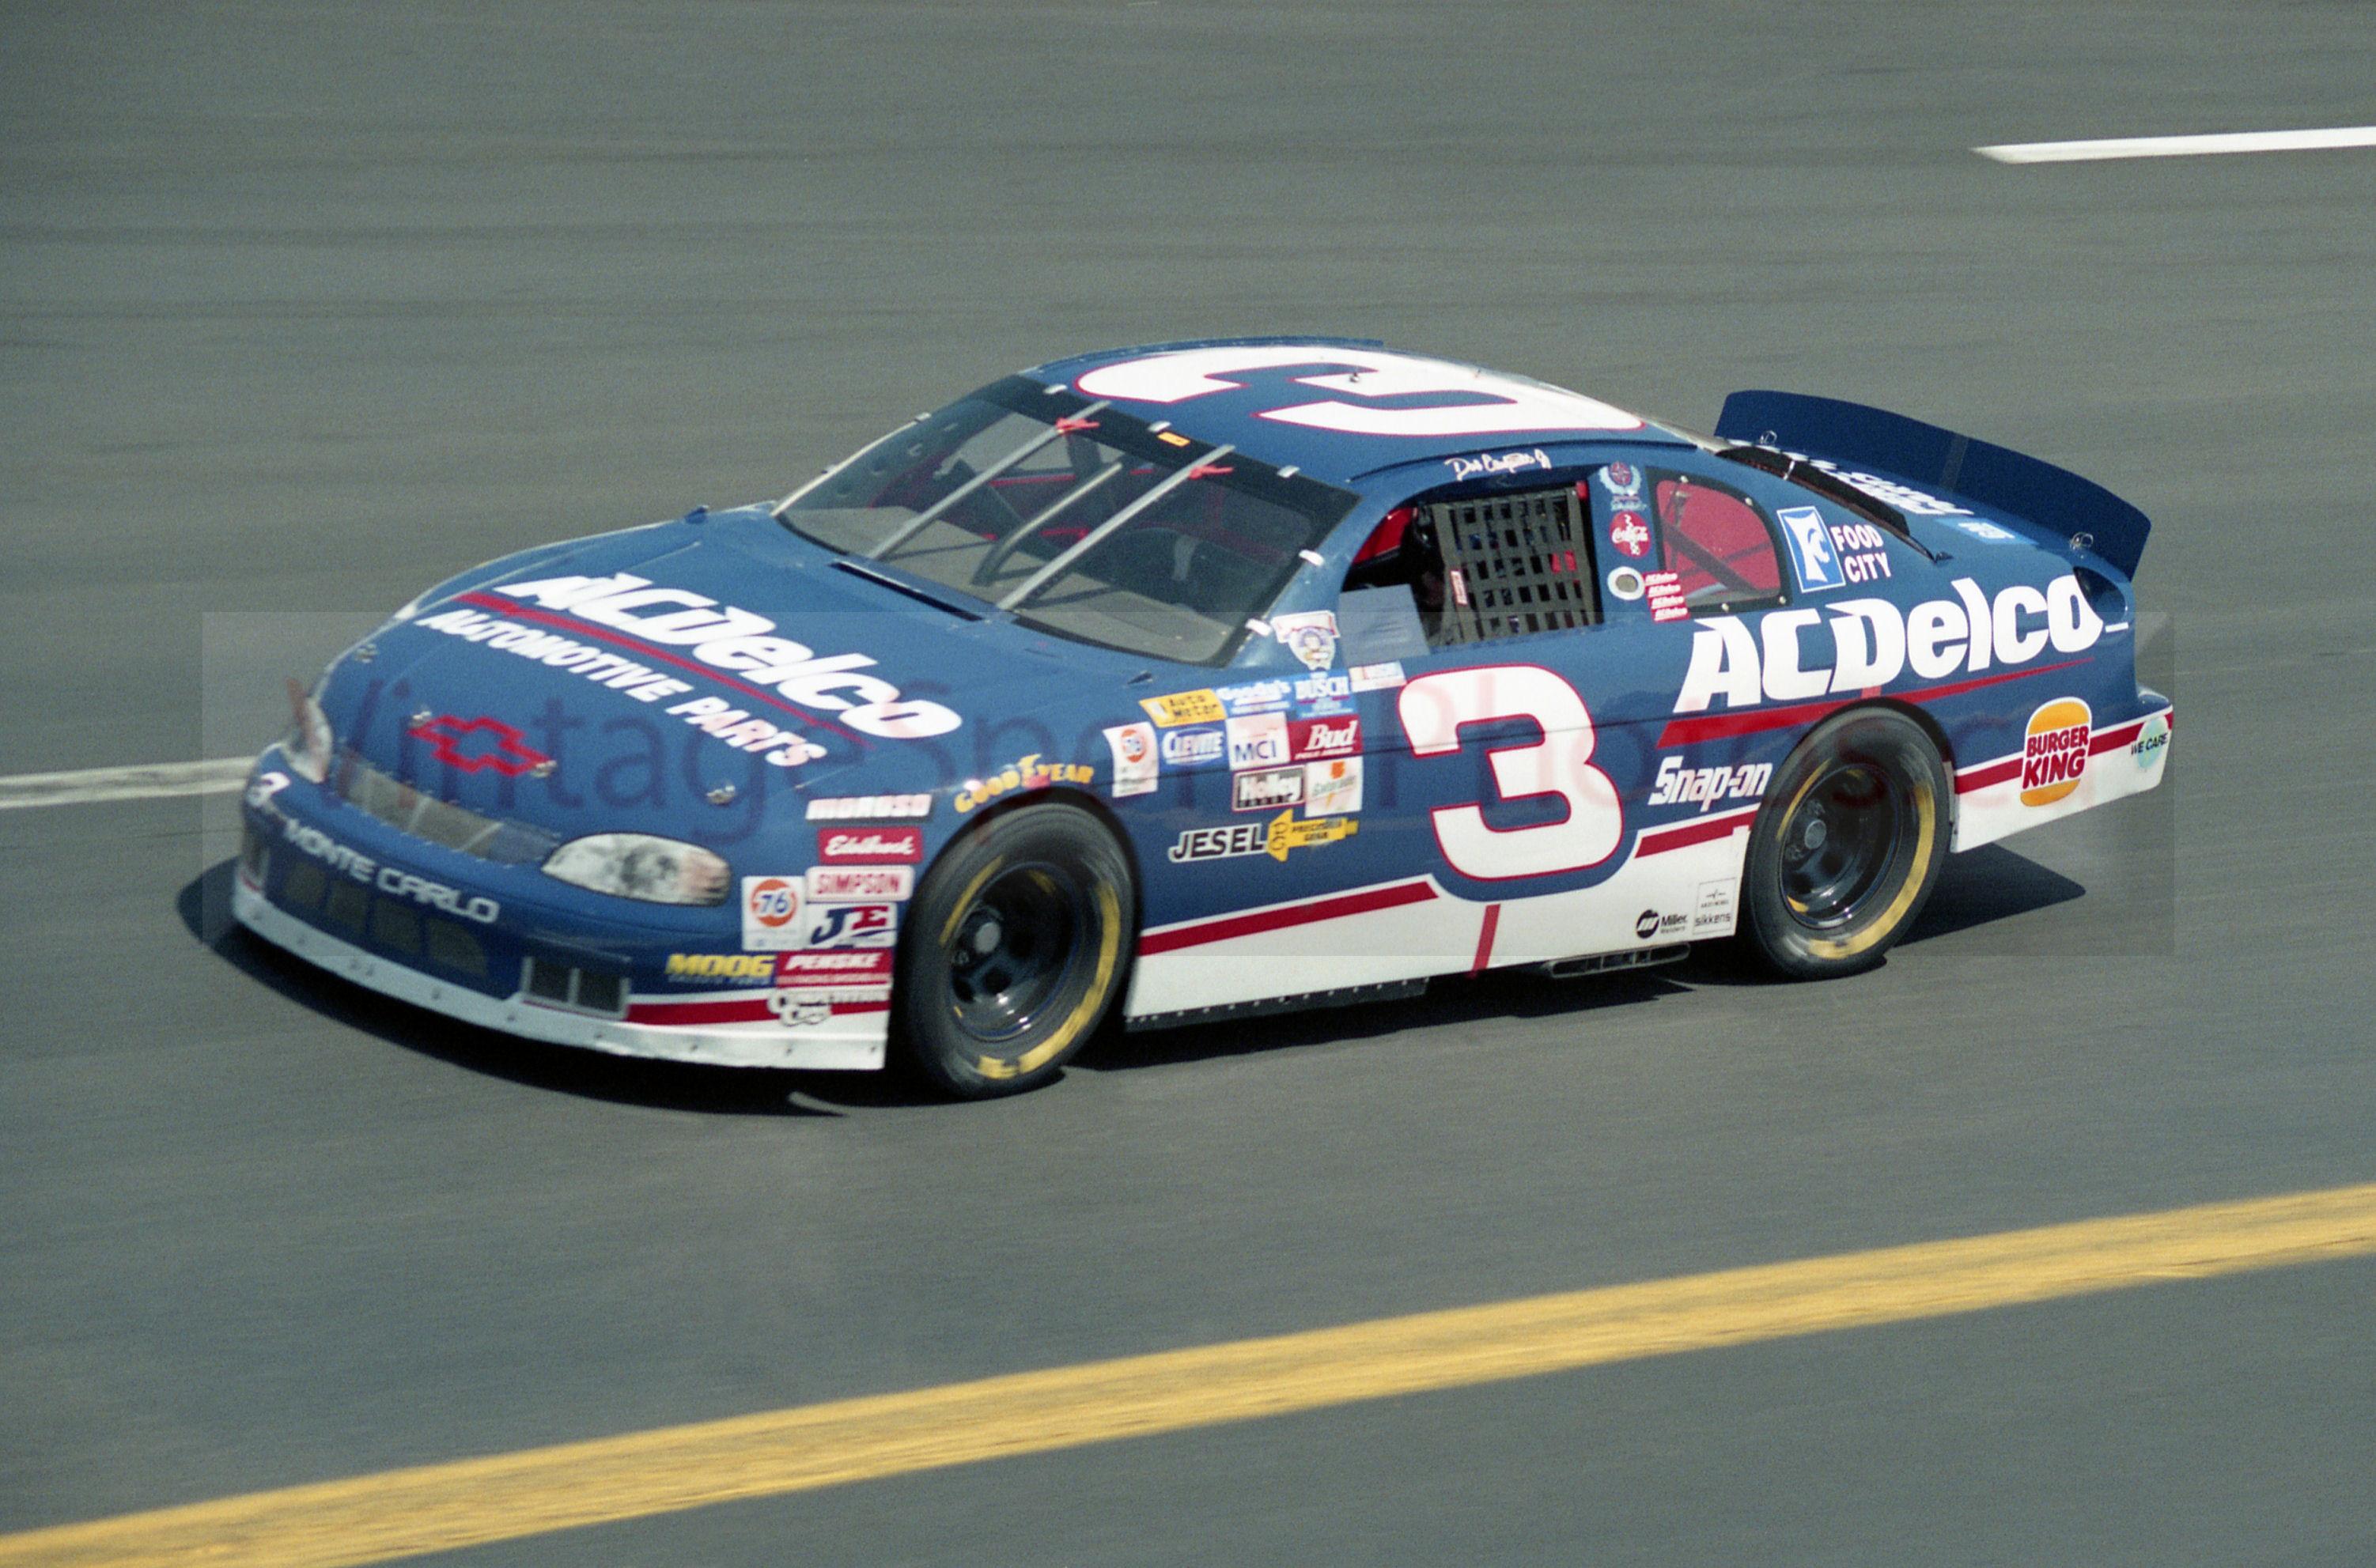 nascar racing | Dale Earnhardt Jr Nascar Vintage Racing AC Delco #3 Car  8X10 or